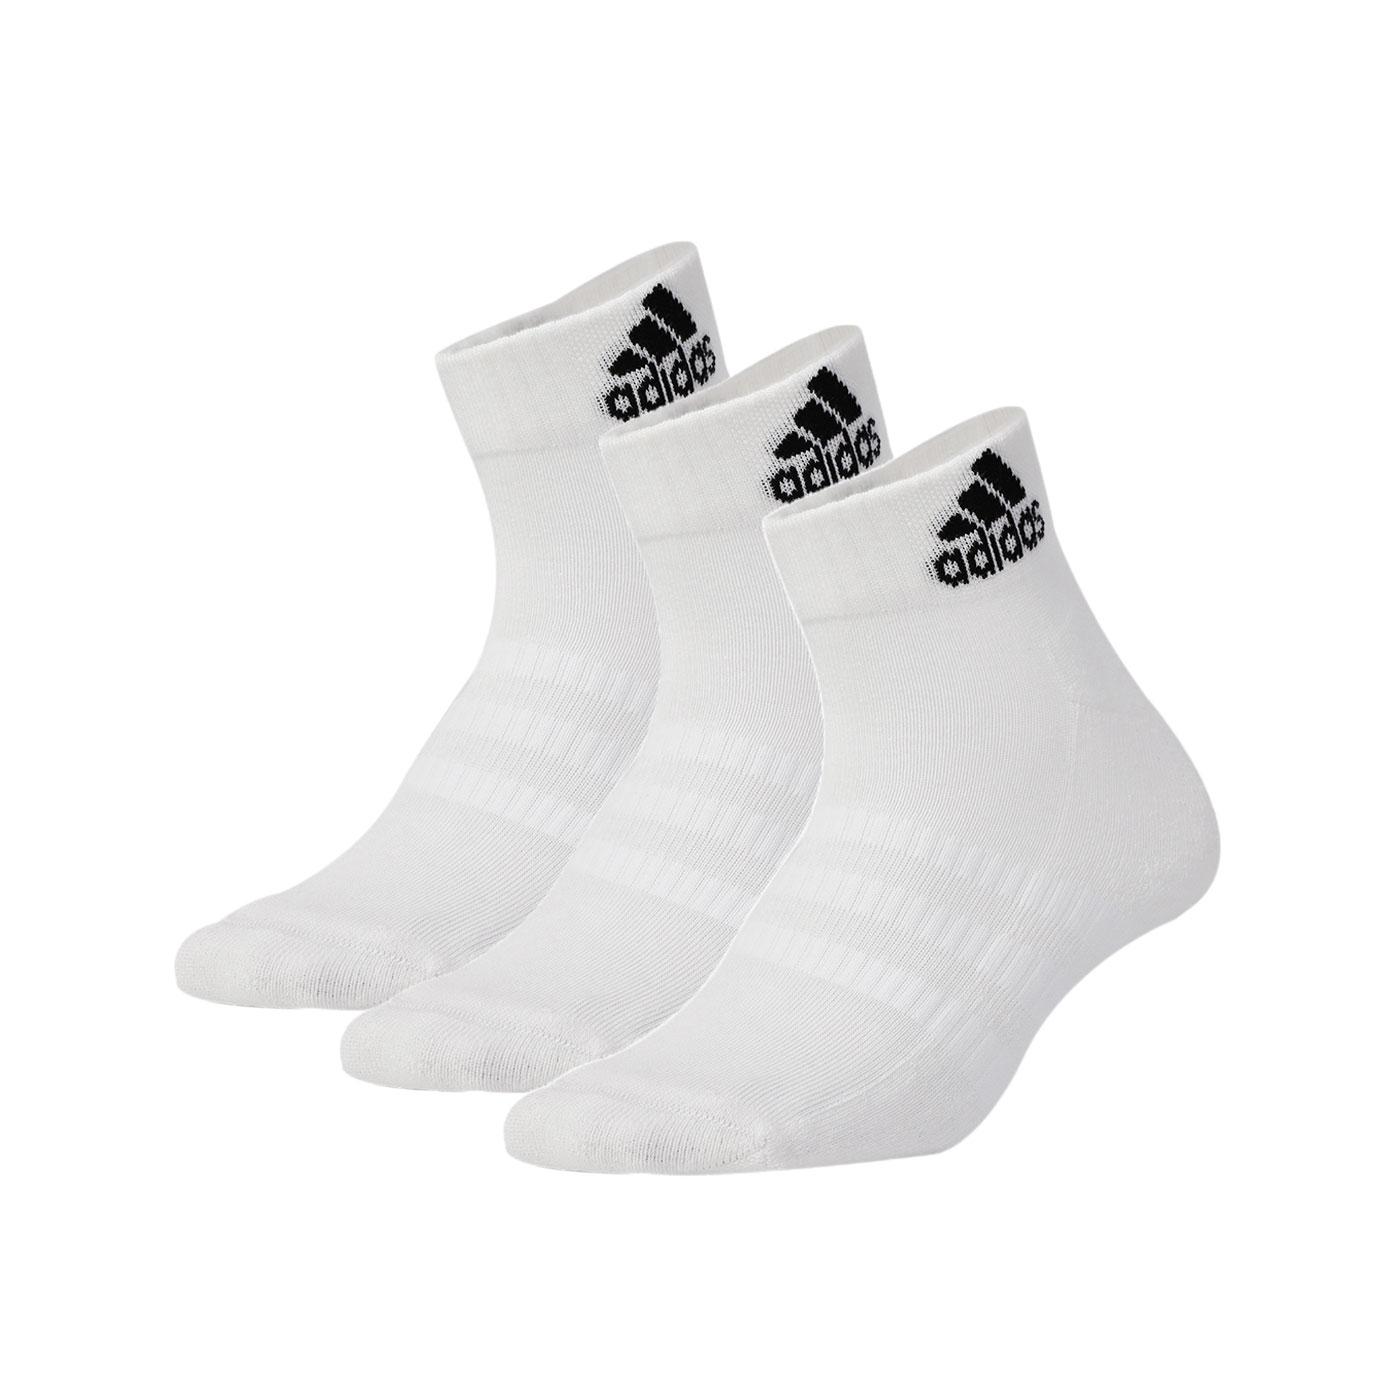 ADIDAS 運動短襪(三雙入) DZ9435 - 白黑